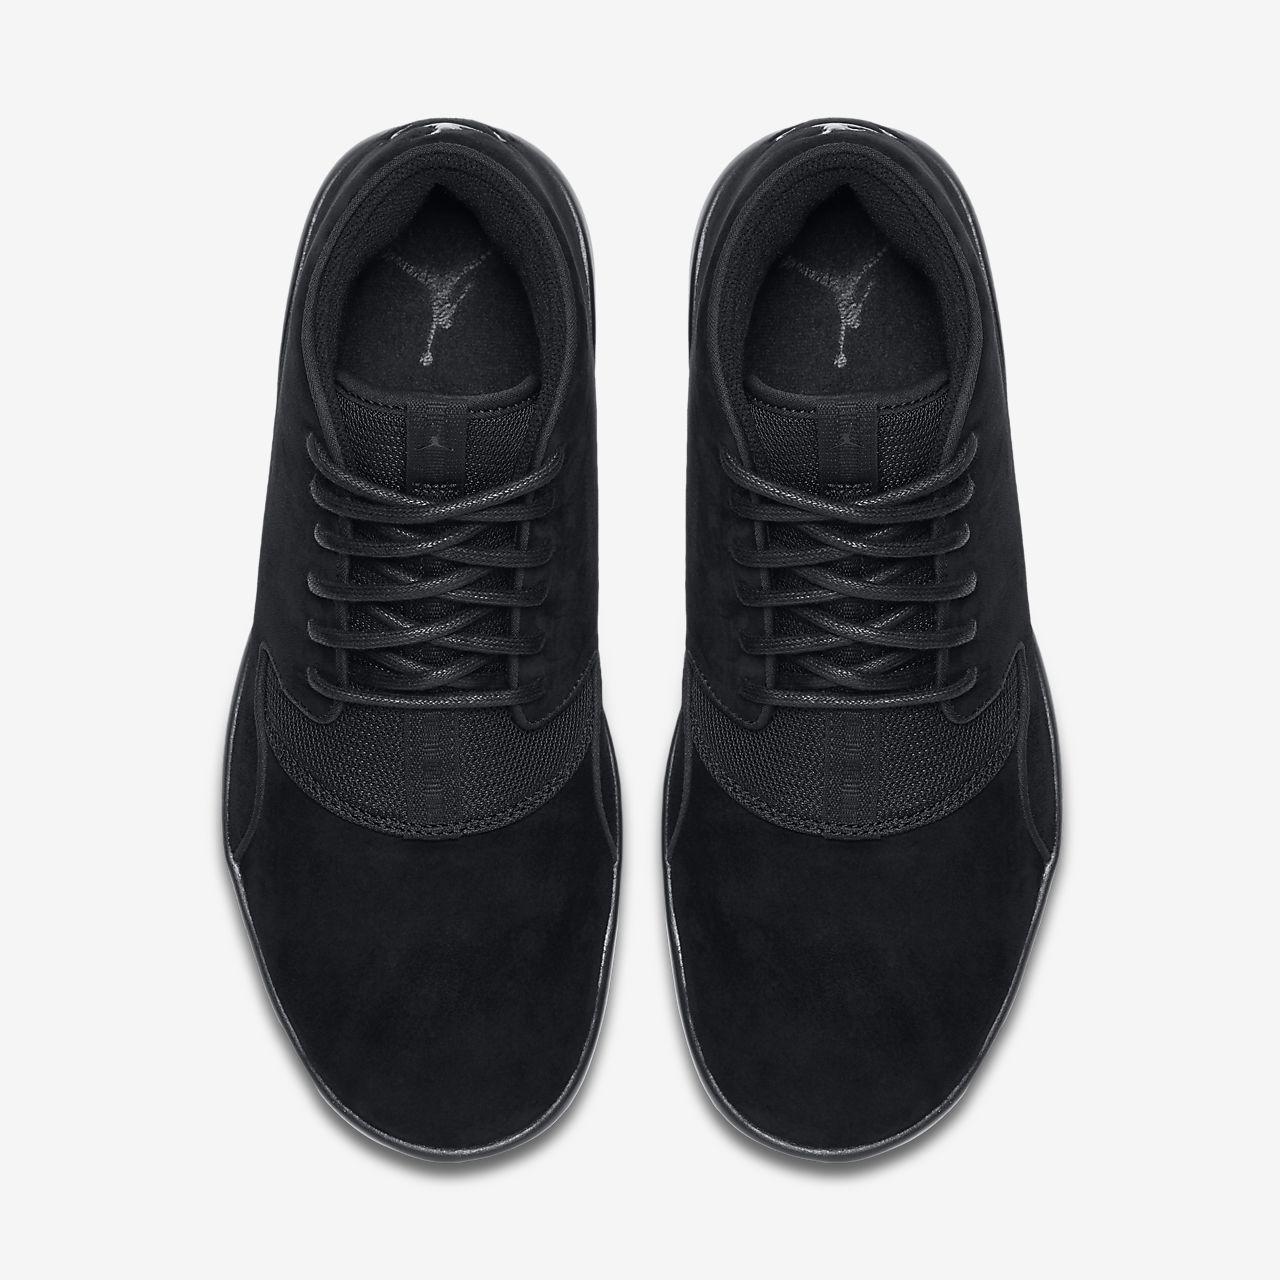 Chaussure Chukka Jordan Eclipse Homme Pour f6gvYb7y